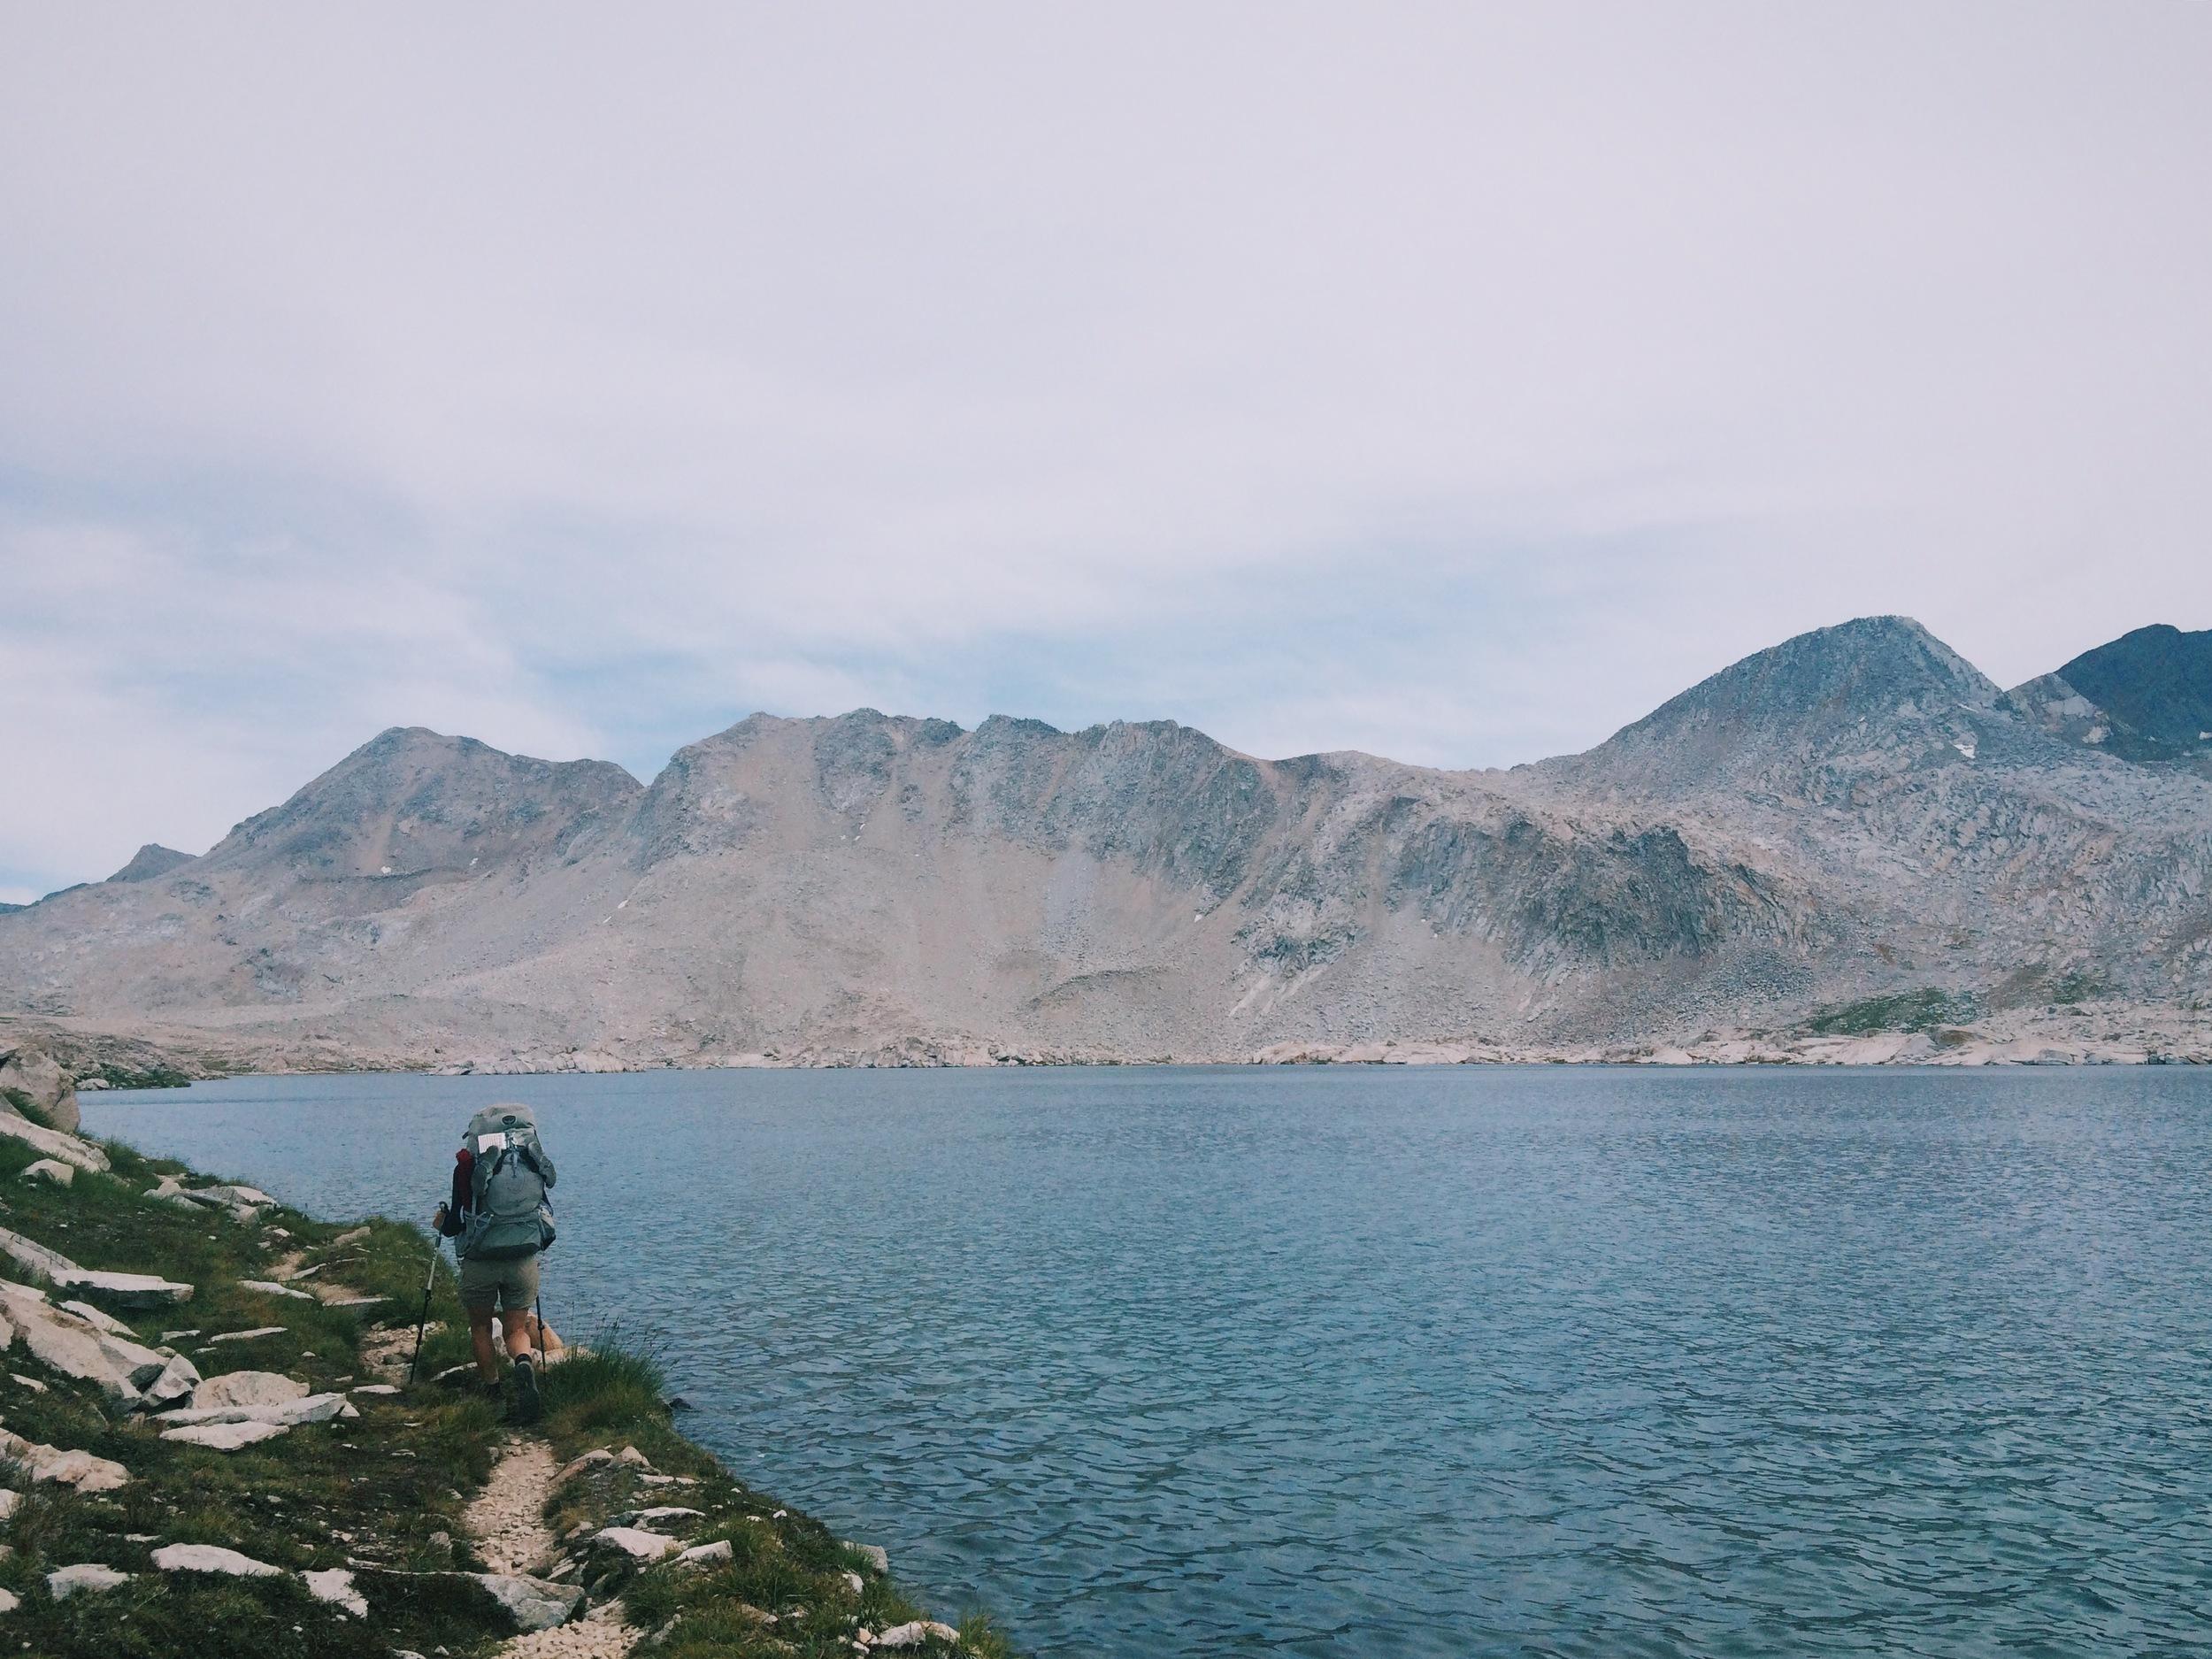 Hiking along the shore of Wanda Lake on the way to Muir Pass.